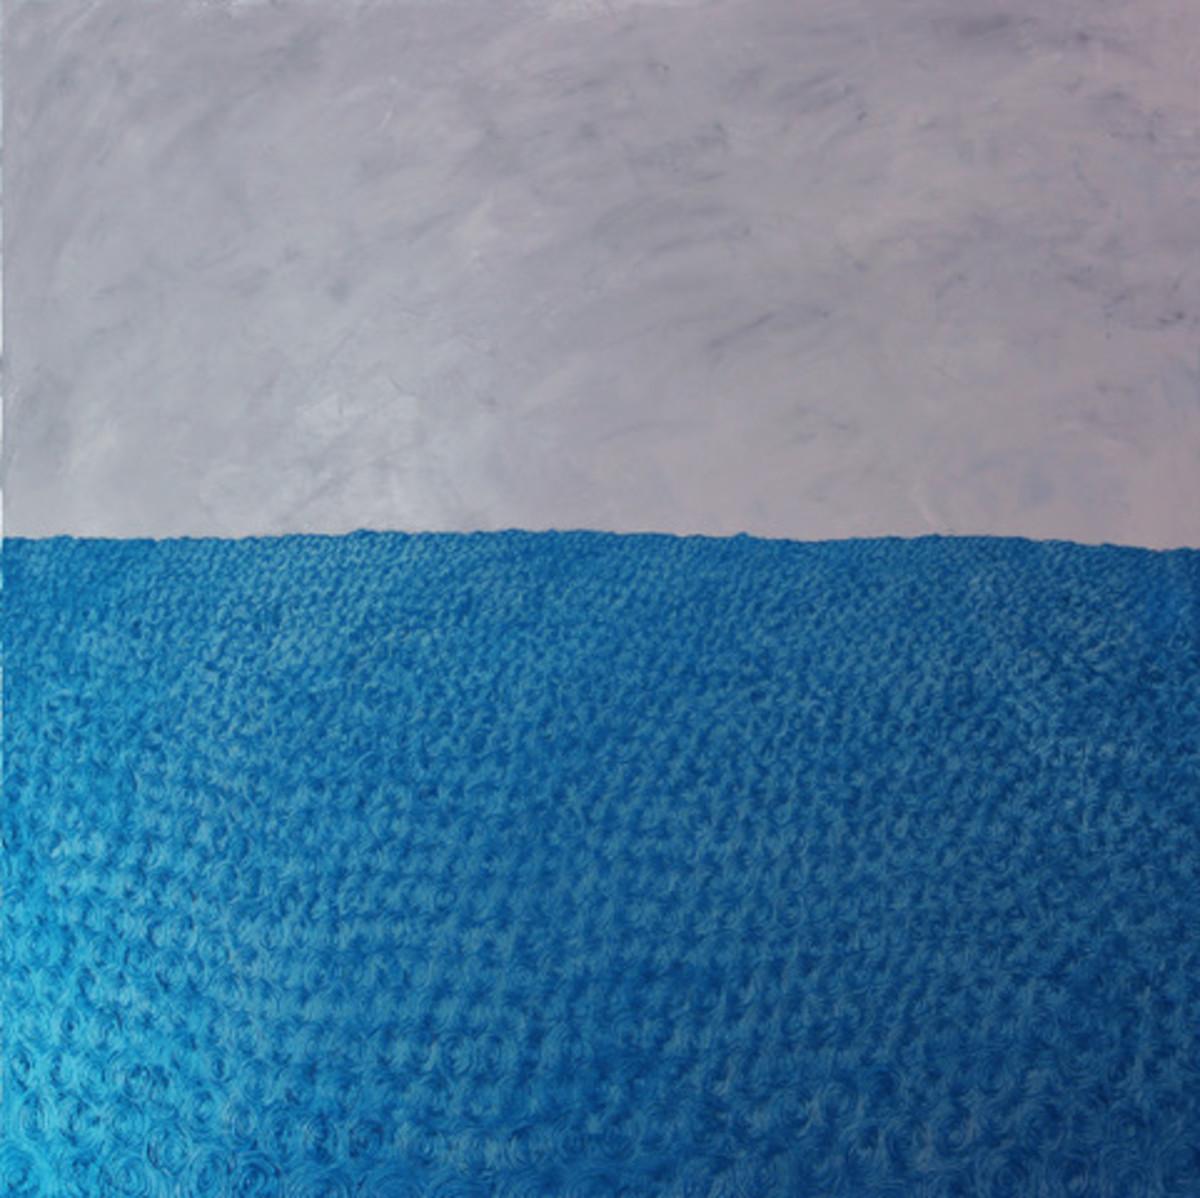 'Into The Blue Again' bySoumiya Krishnaswamy